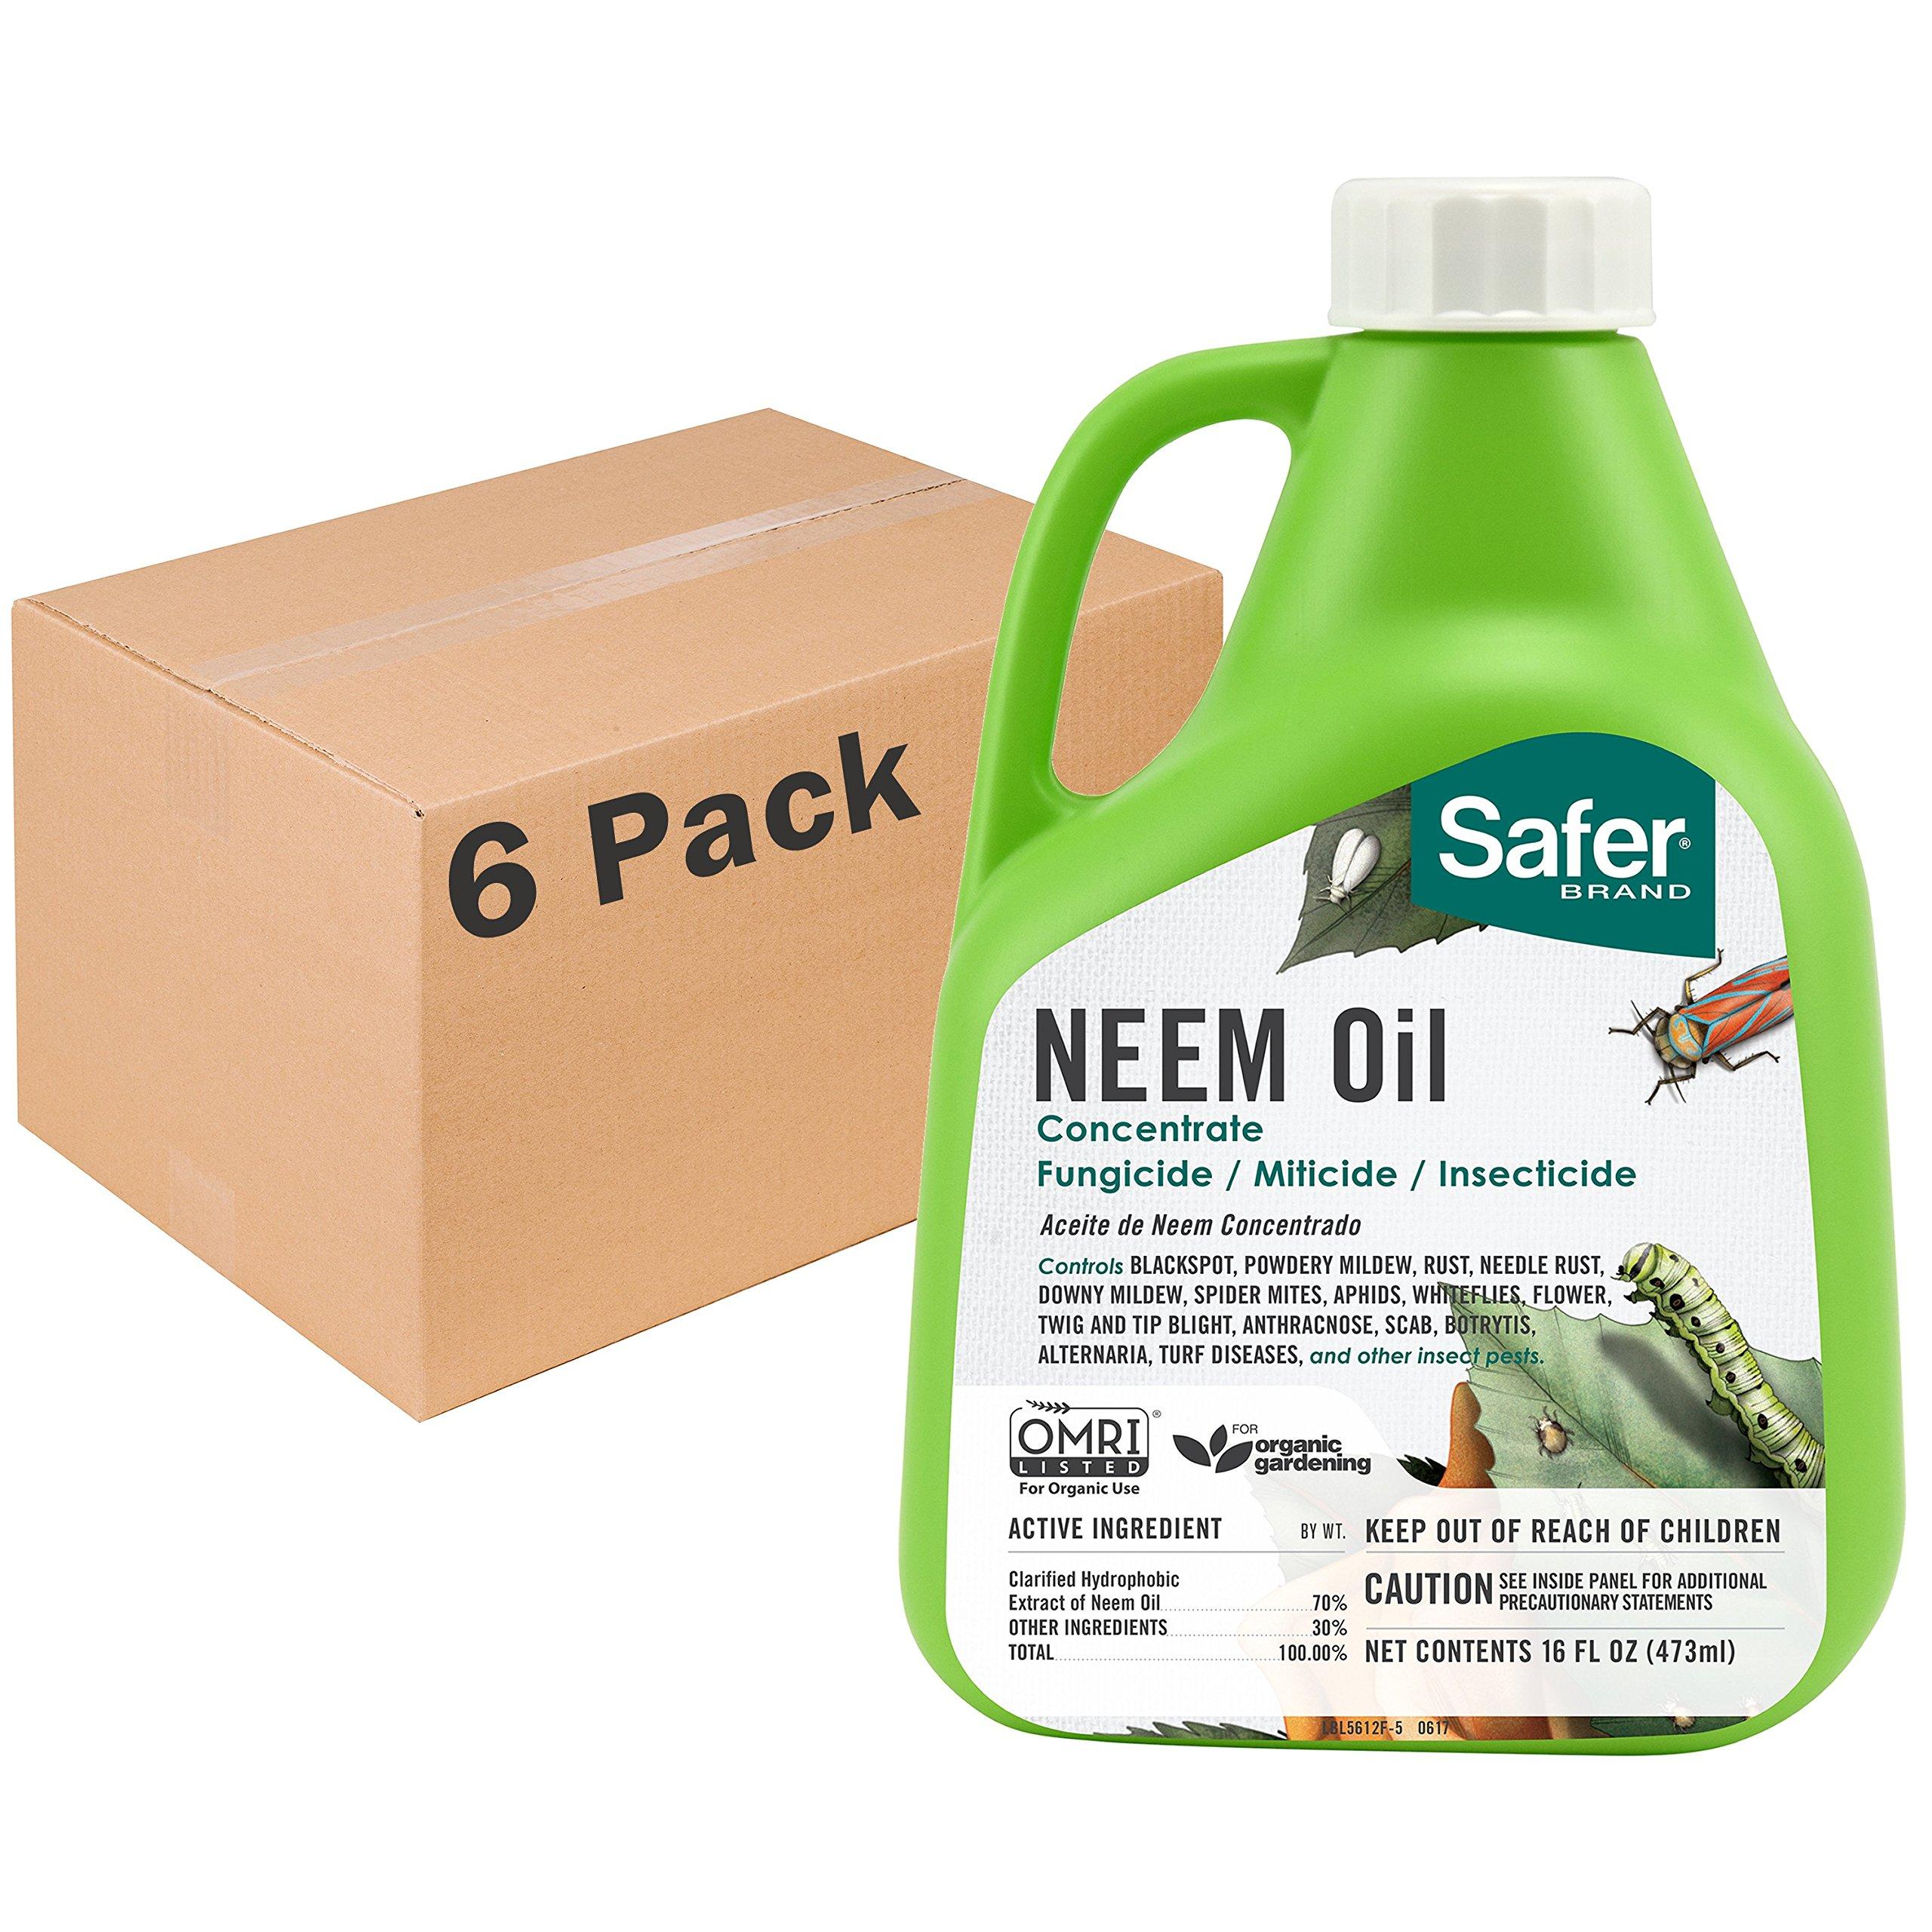 Safer Brand Neem Oil Concentrate 16oz by Safer Brand